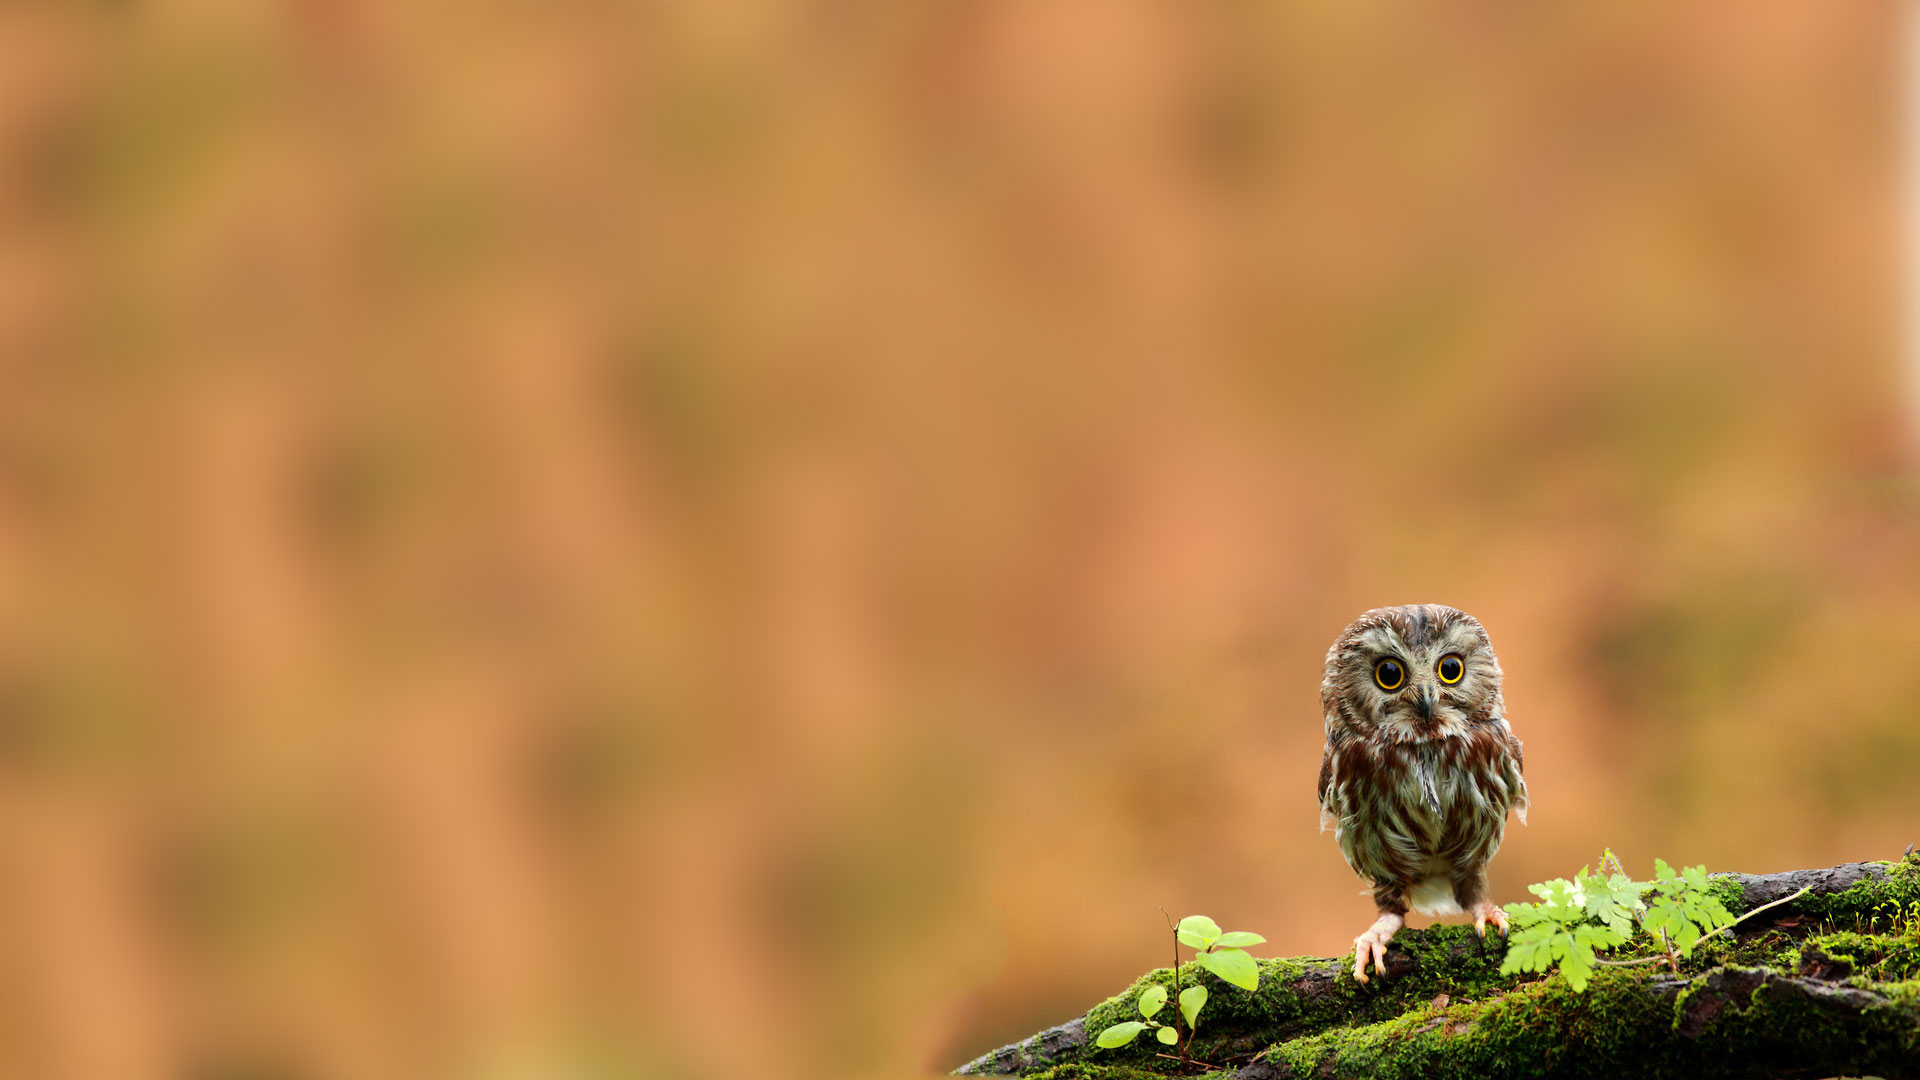 45 Cute Owl Wallpaper Hd On Wallpapersafari